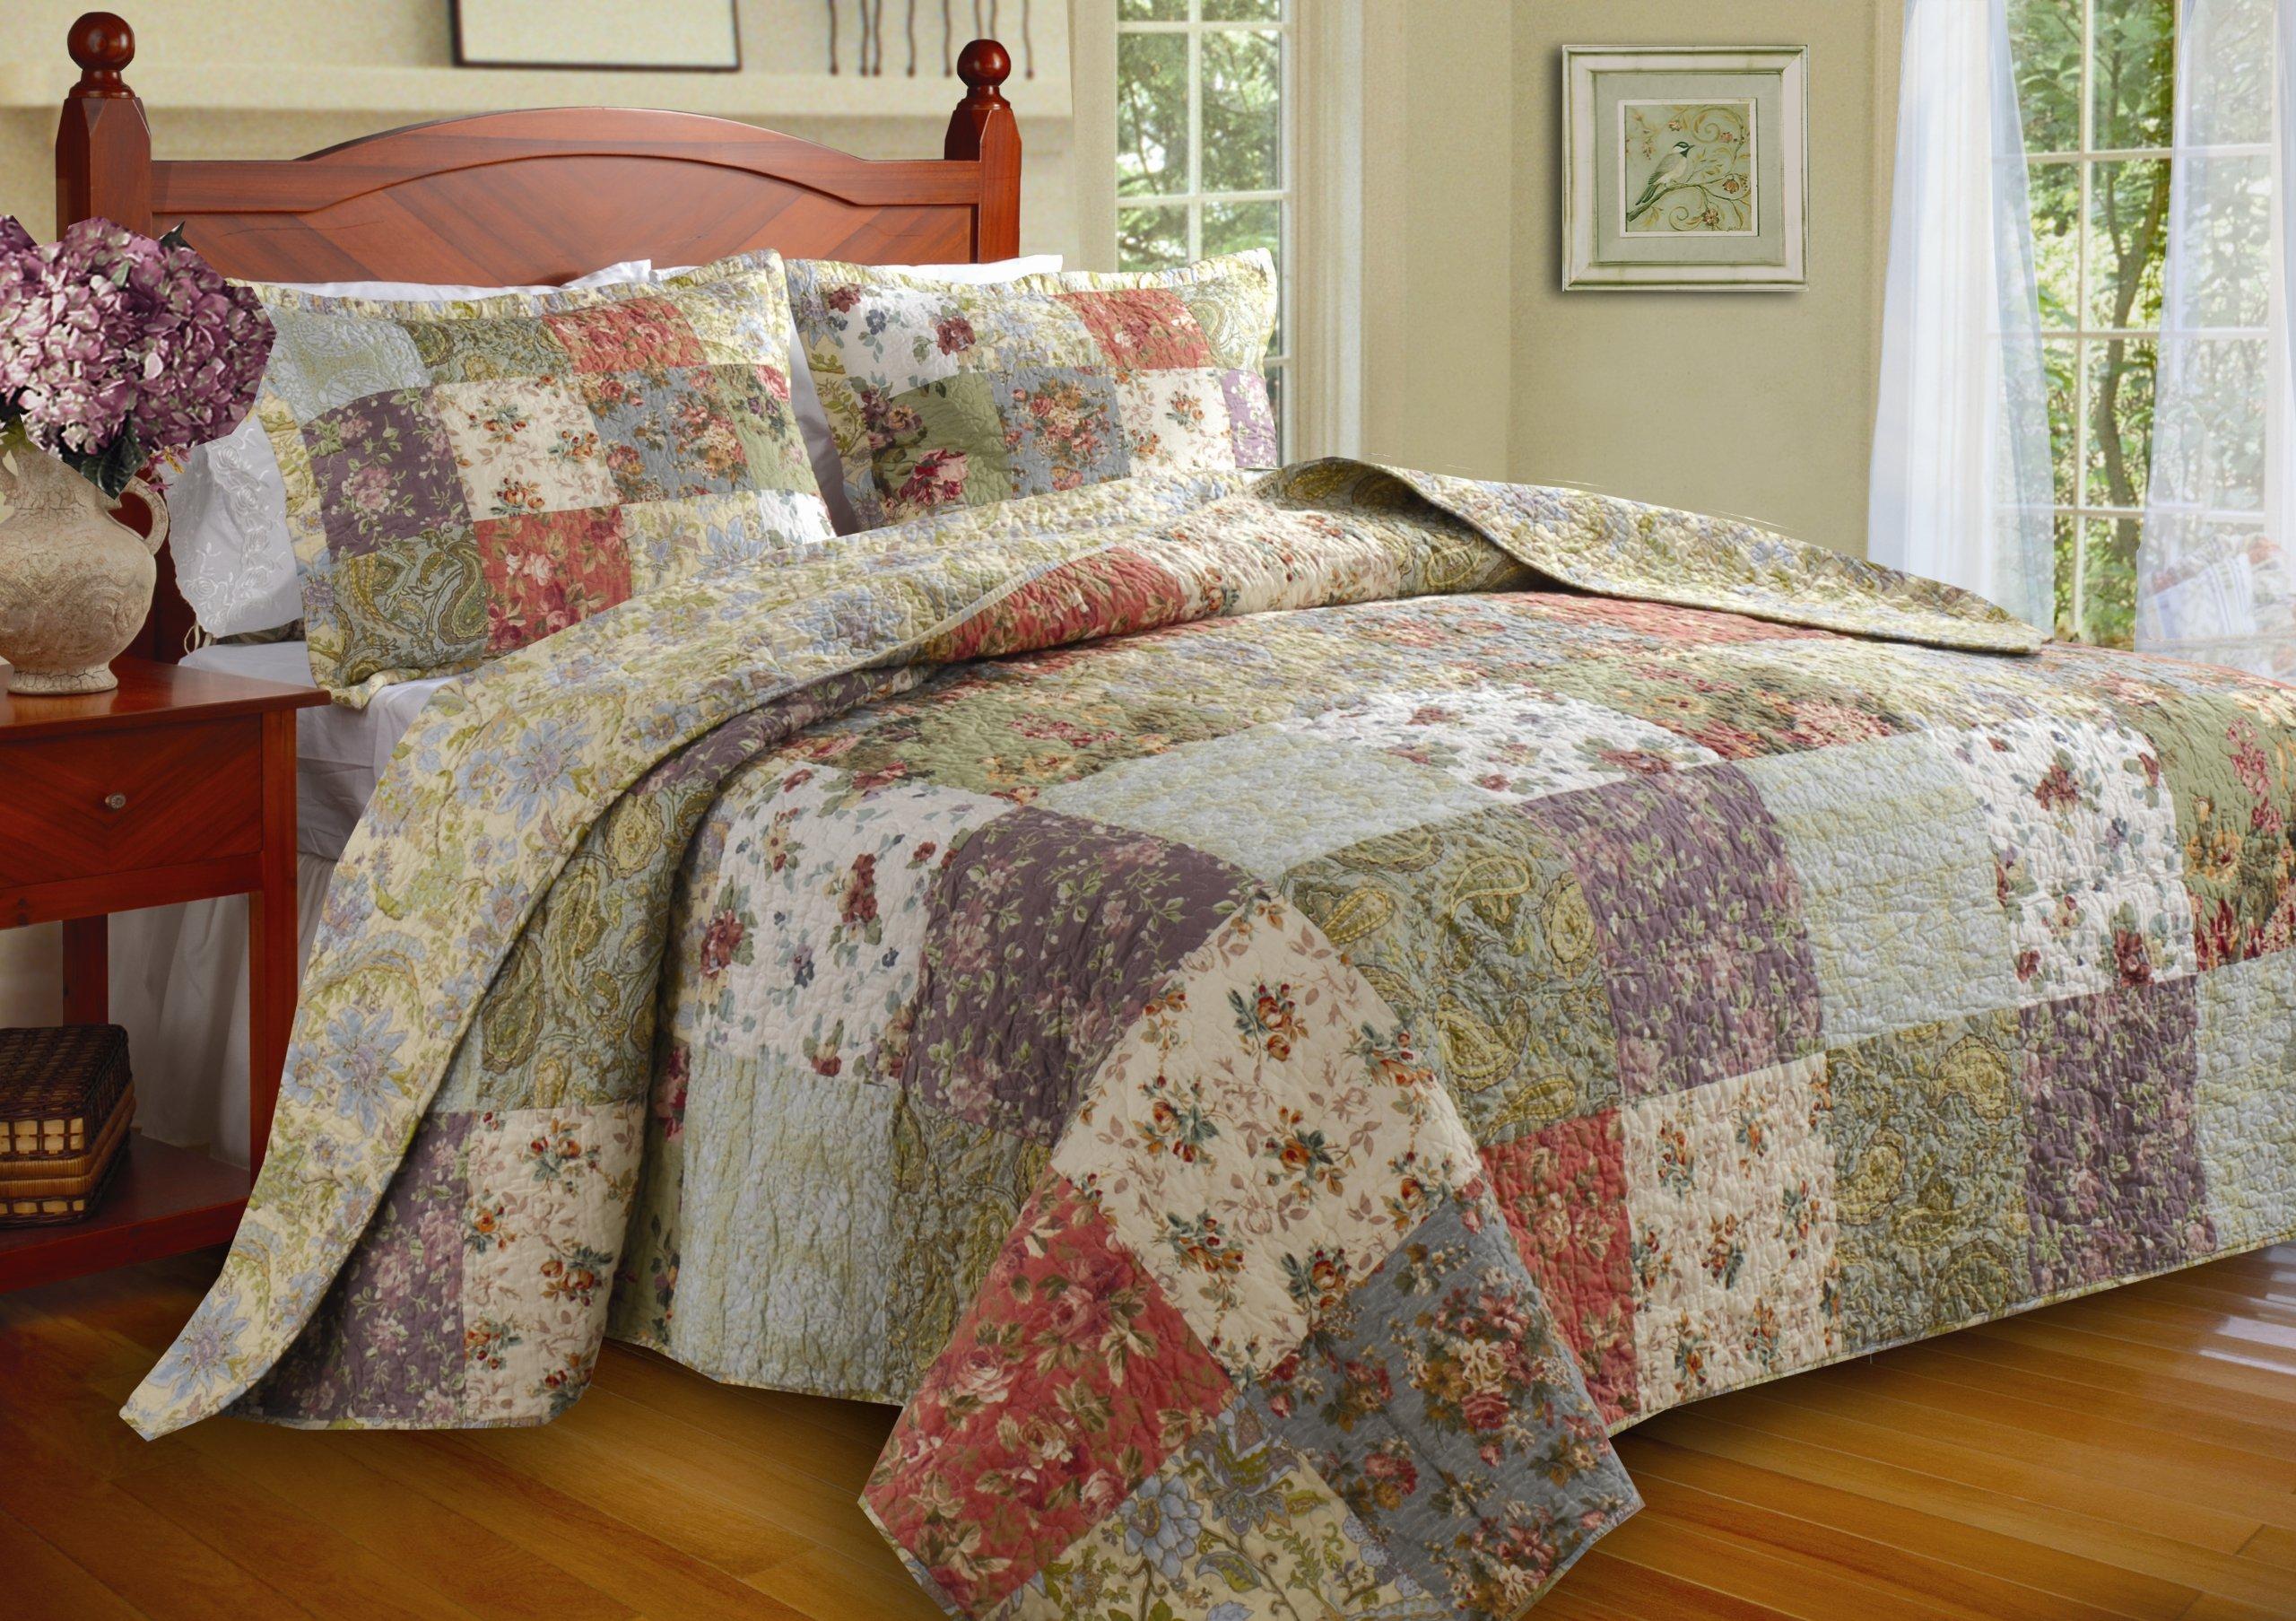 Greenland Home Blooming Prairie Twin 2-Piece Bedspread Set